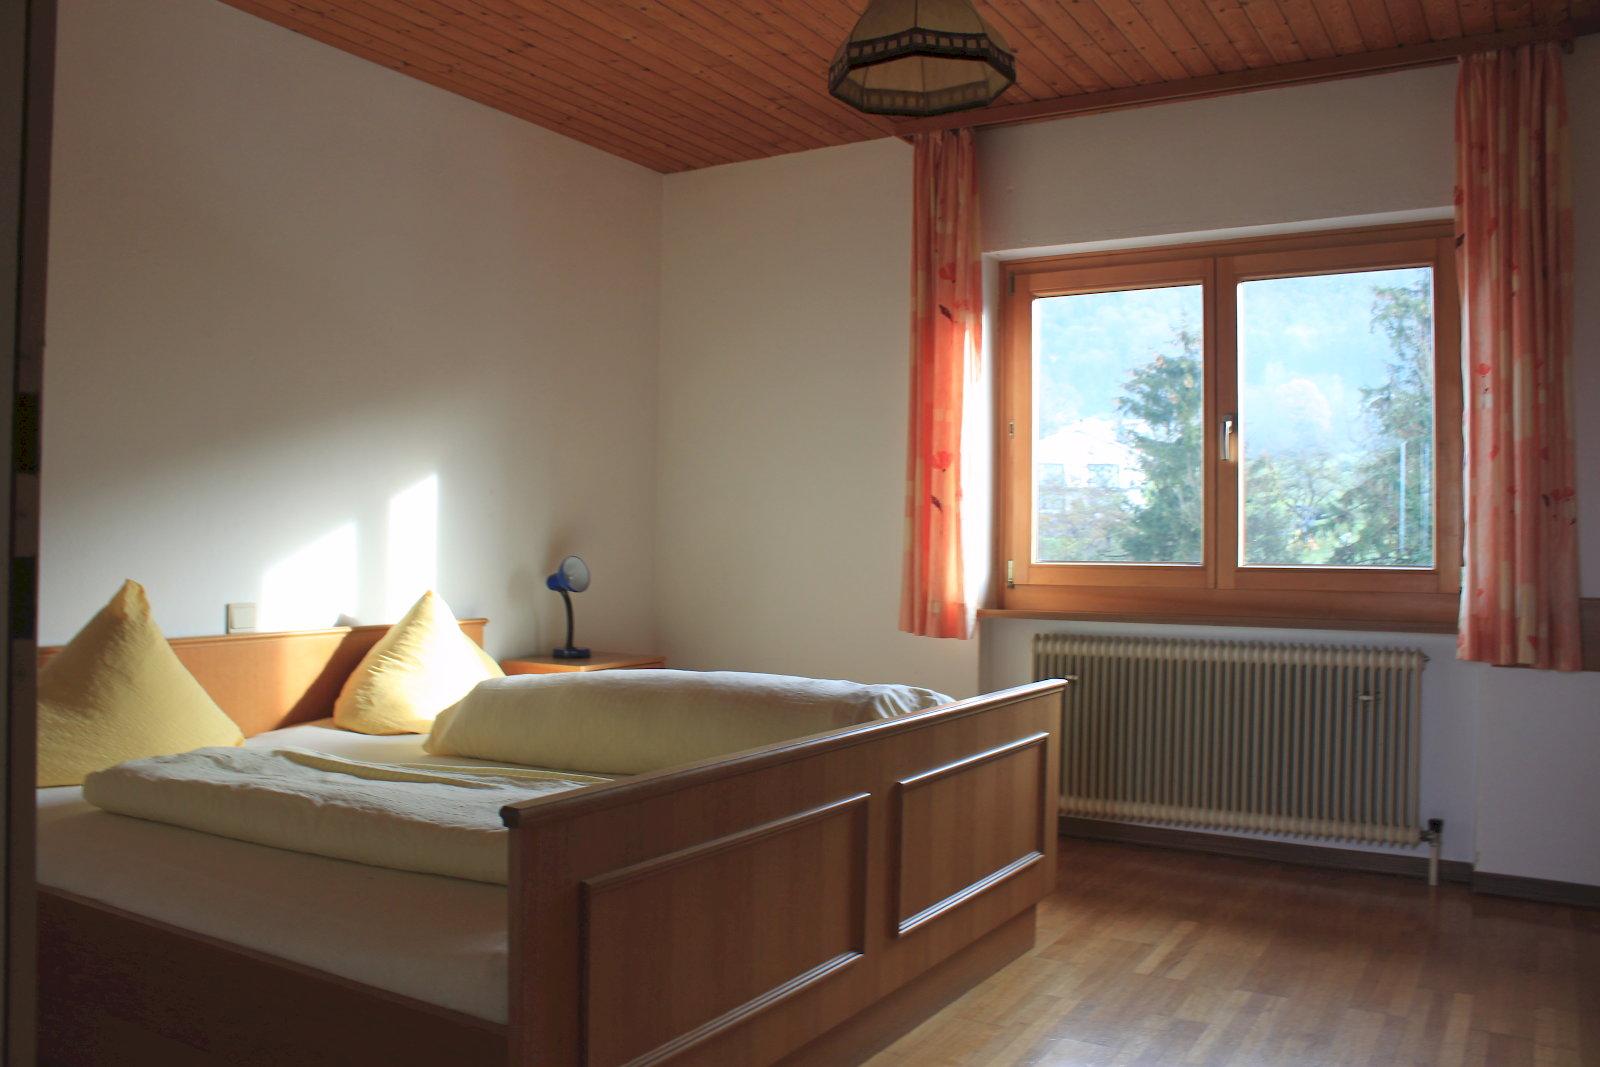 Appartement de vacances B&B - Restaurant TSINGDAO (Hörbranz). Doppelzimmer (2437460), Hörbranz, Bregenz, Vorarlberg, Autriche, image 4